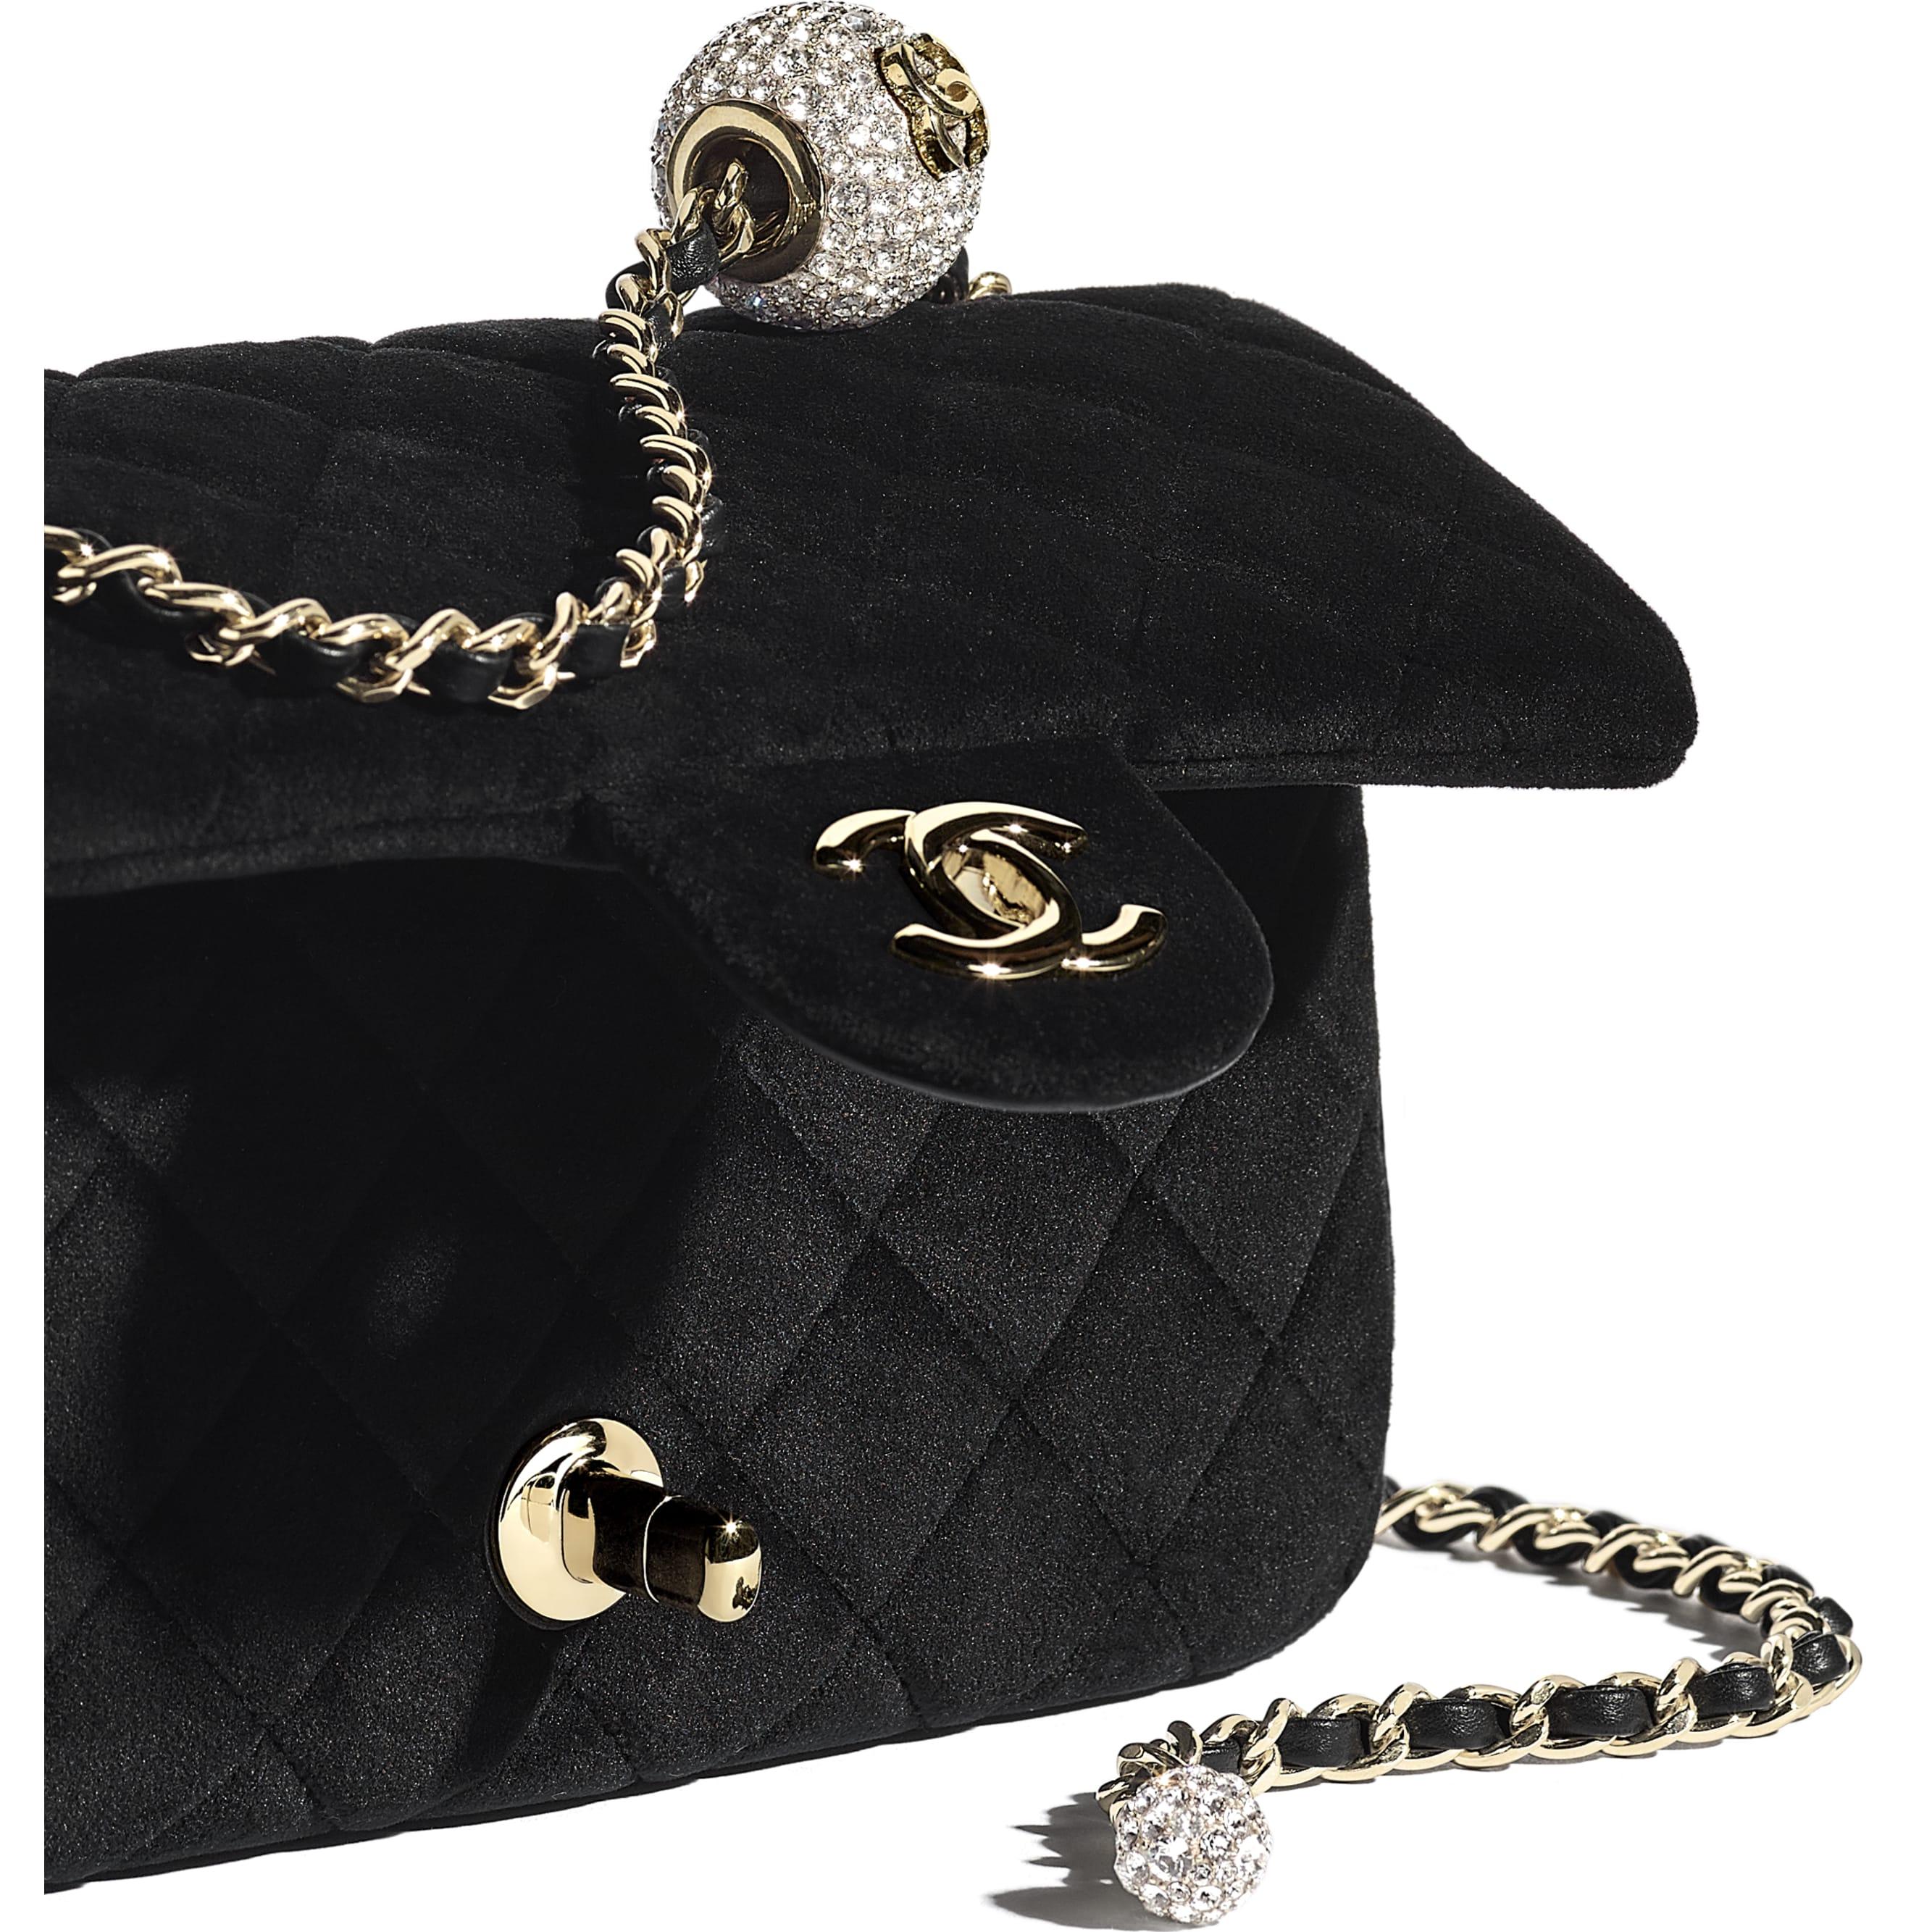 Flap Bag - Black - Velvet, Diamanté & Gold-Tone Metal - CHANEL - Extra view - see standard sized version